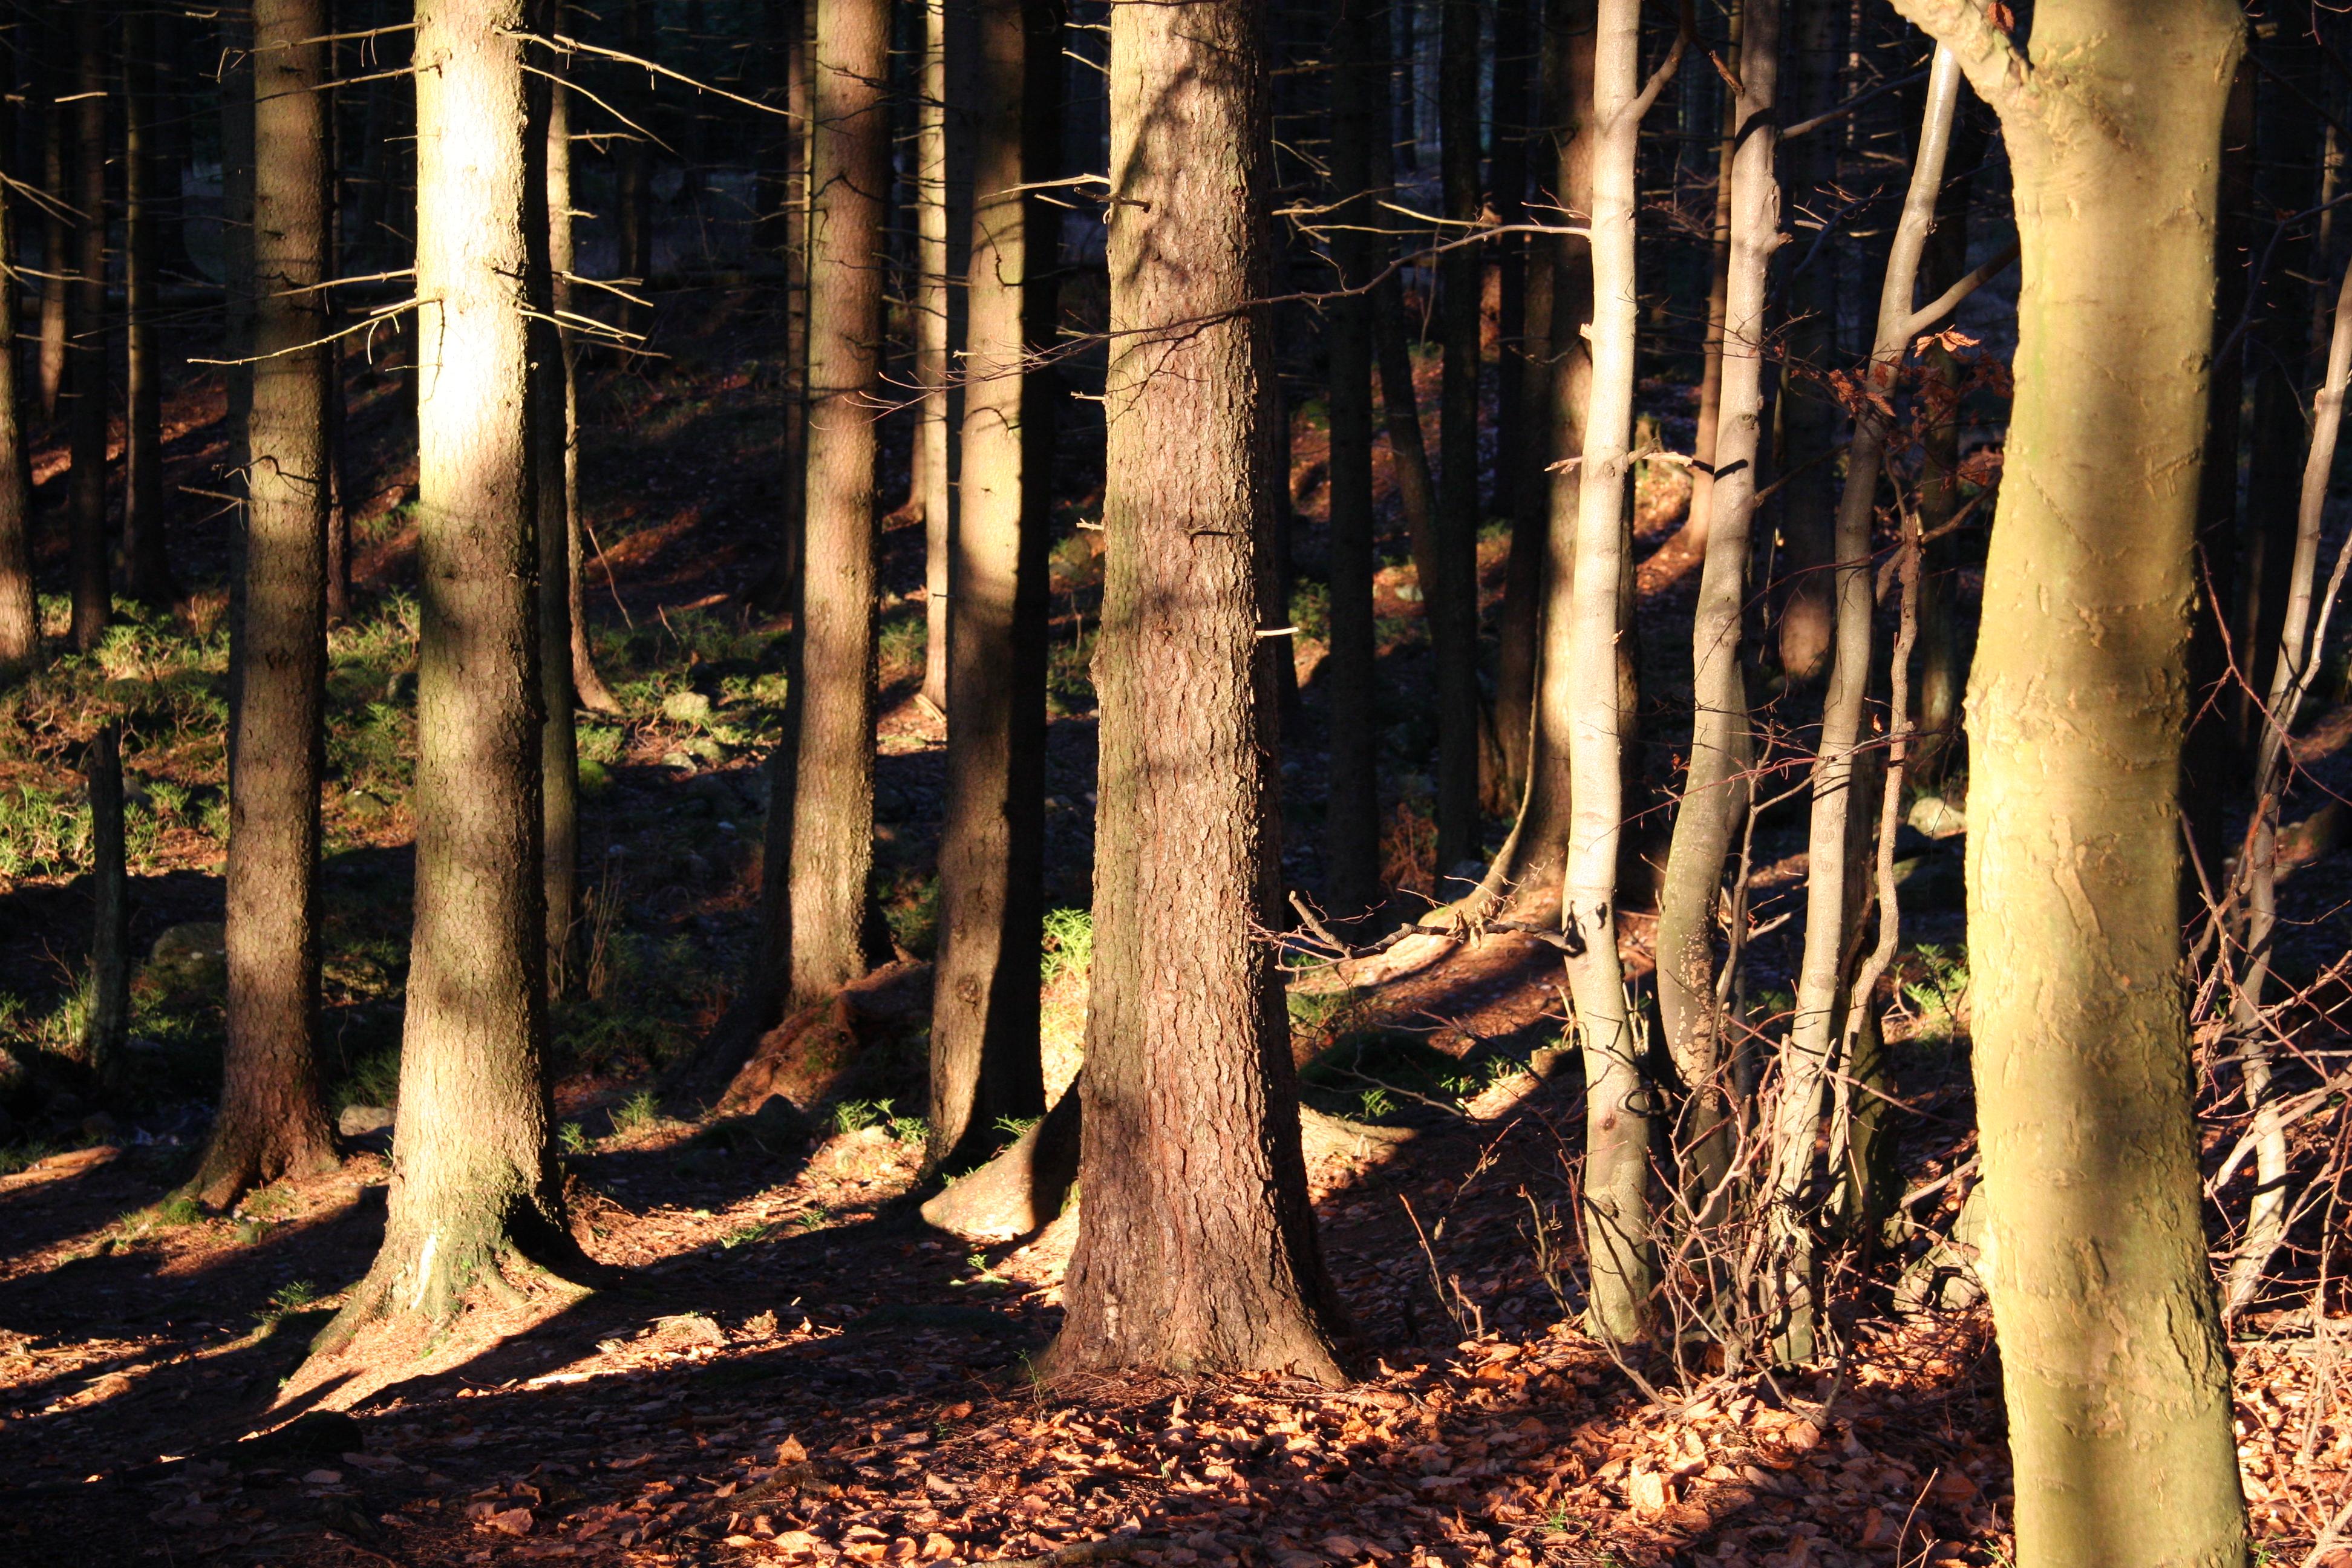 Les nedaleko Harrachova v Krkonoších